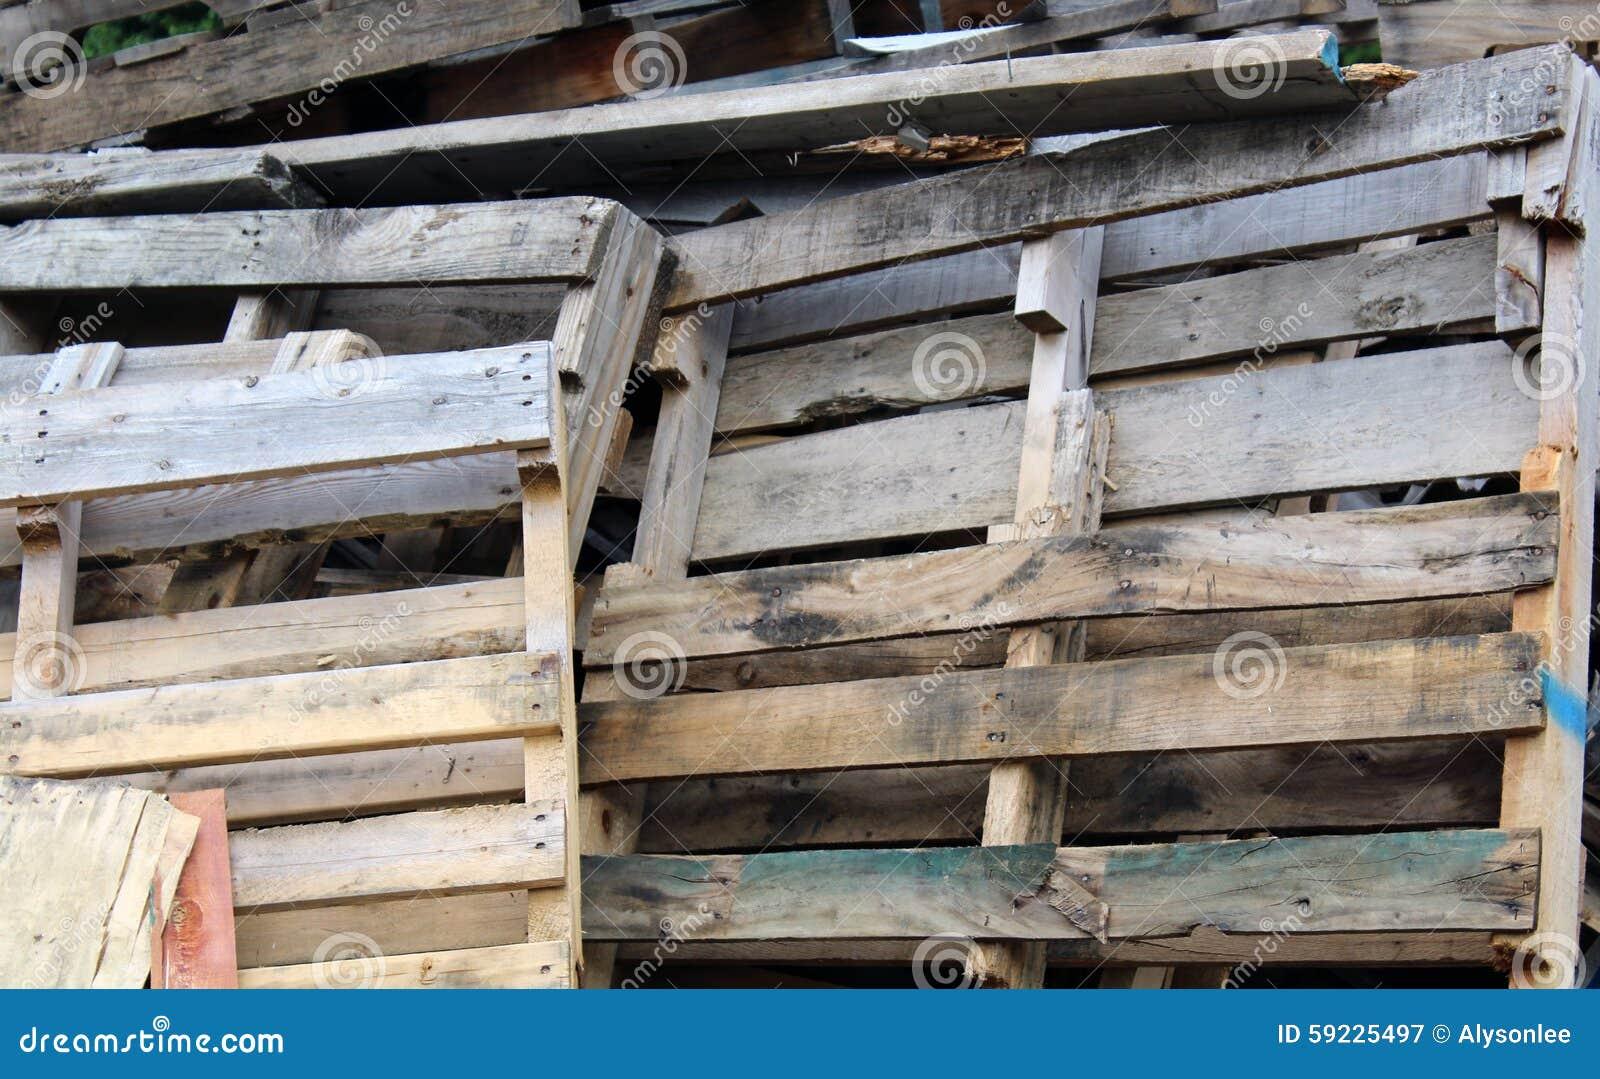 Download Pila De Plataformas De Madera Imagen de archivo - Imagen de fondo, wooden: 59225497